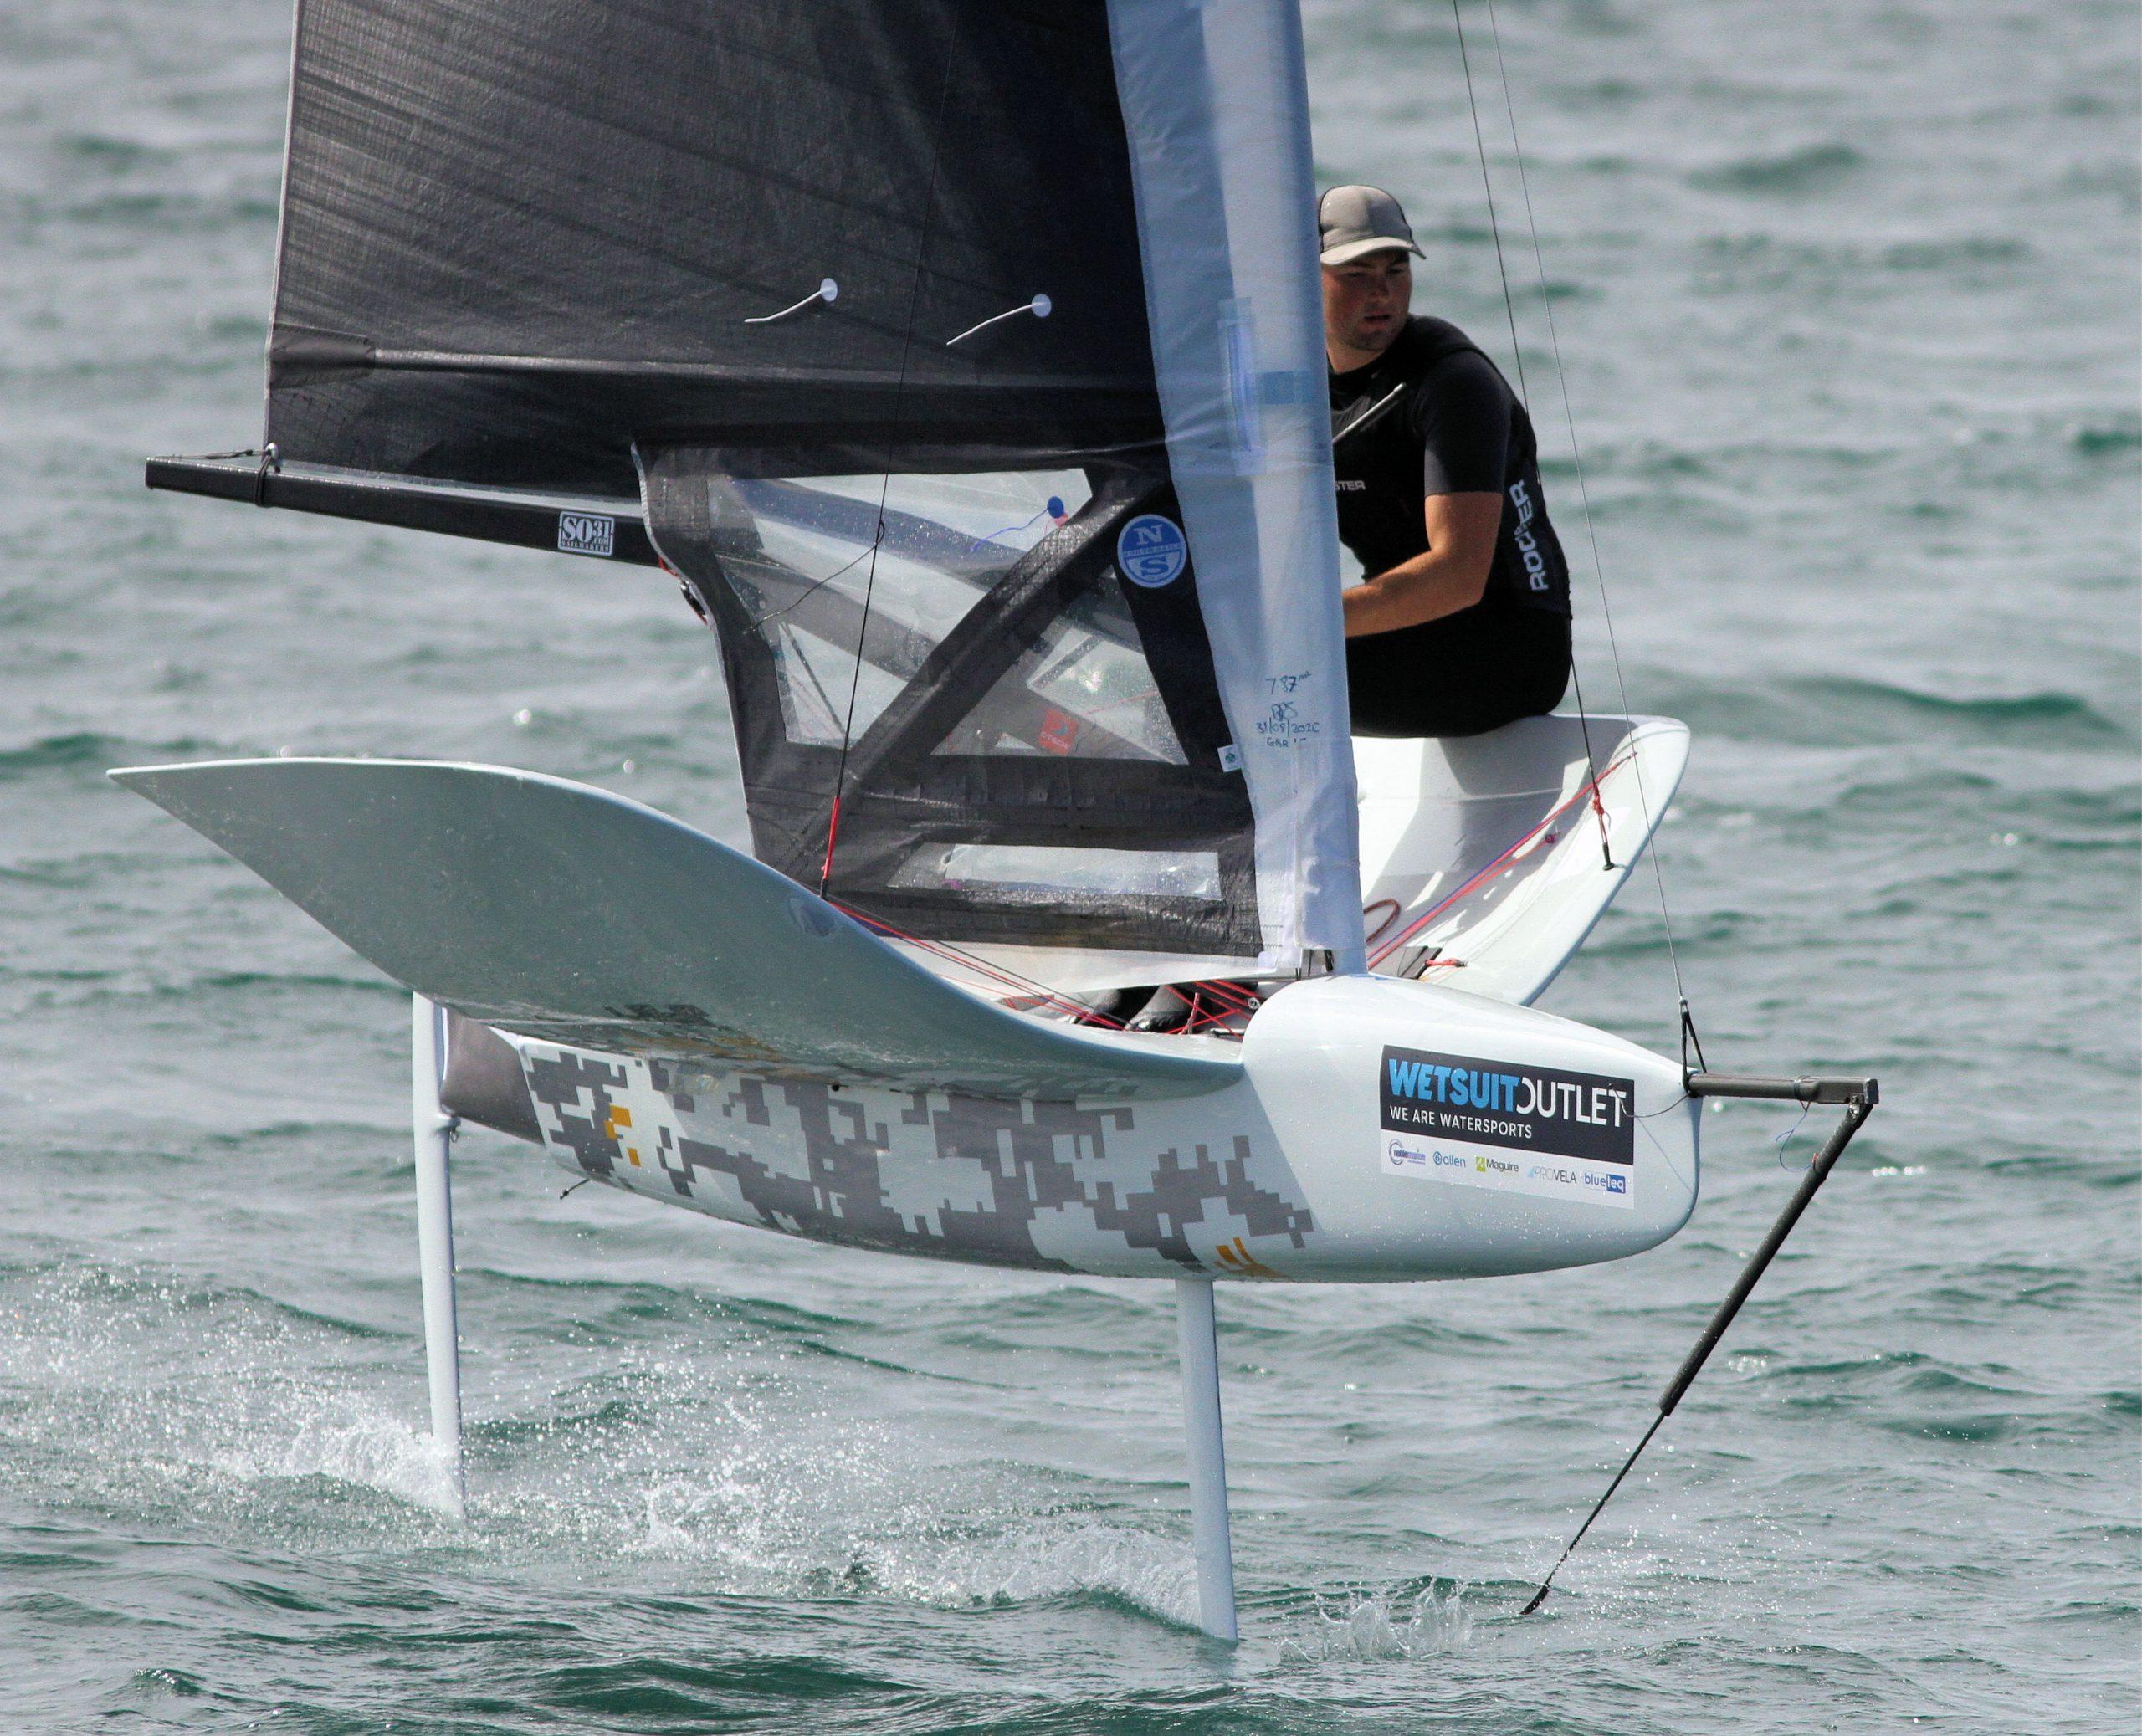 Billy Vennis-Ozanne sailing his rocket international moth